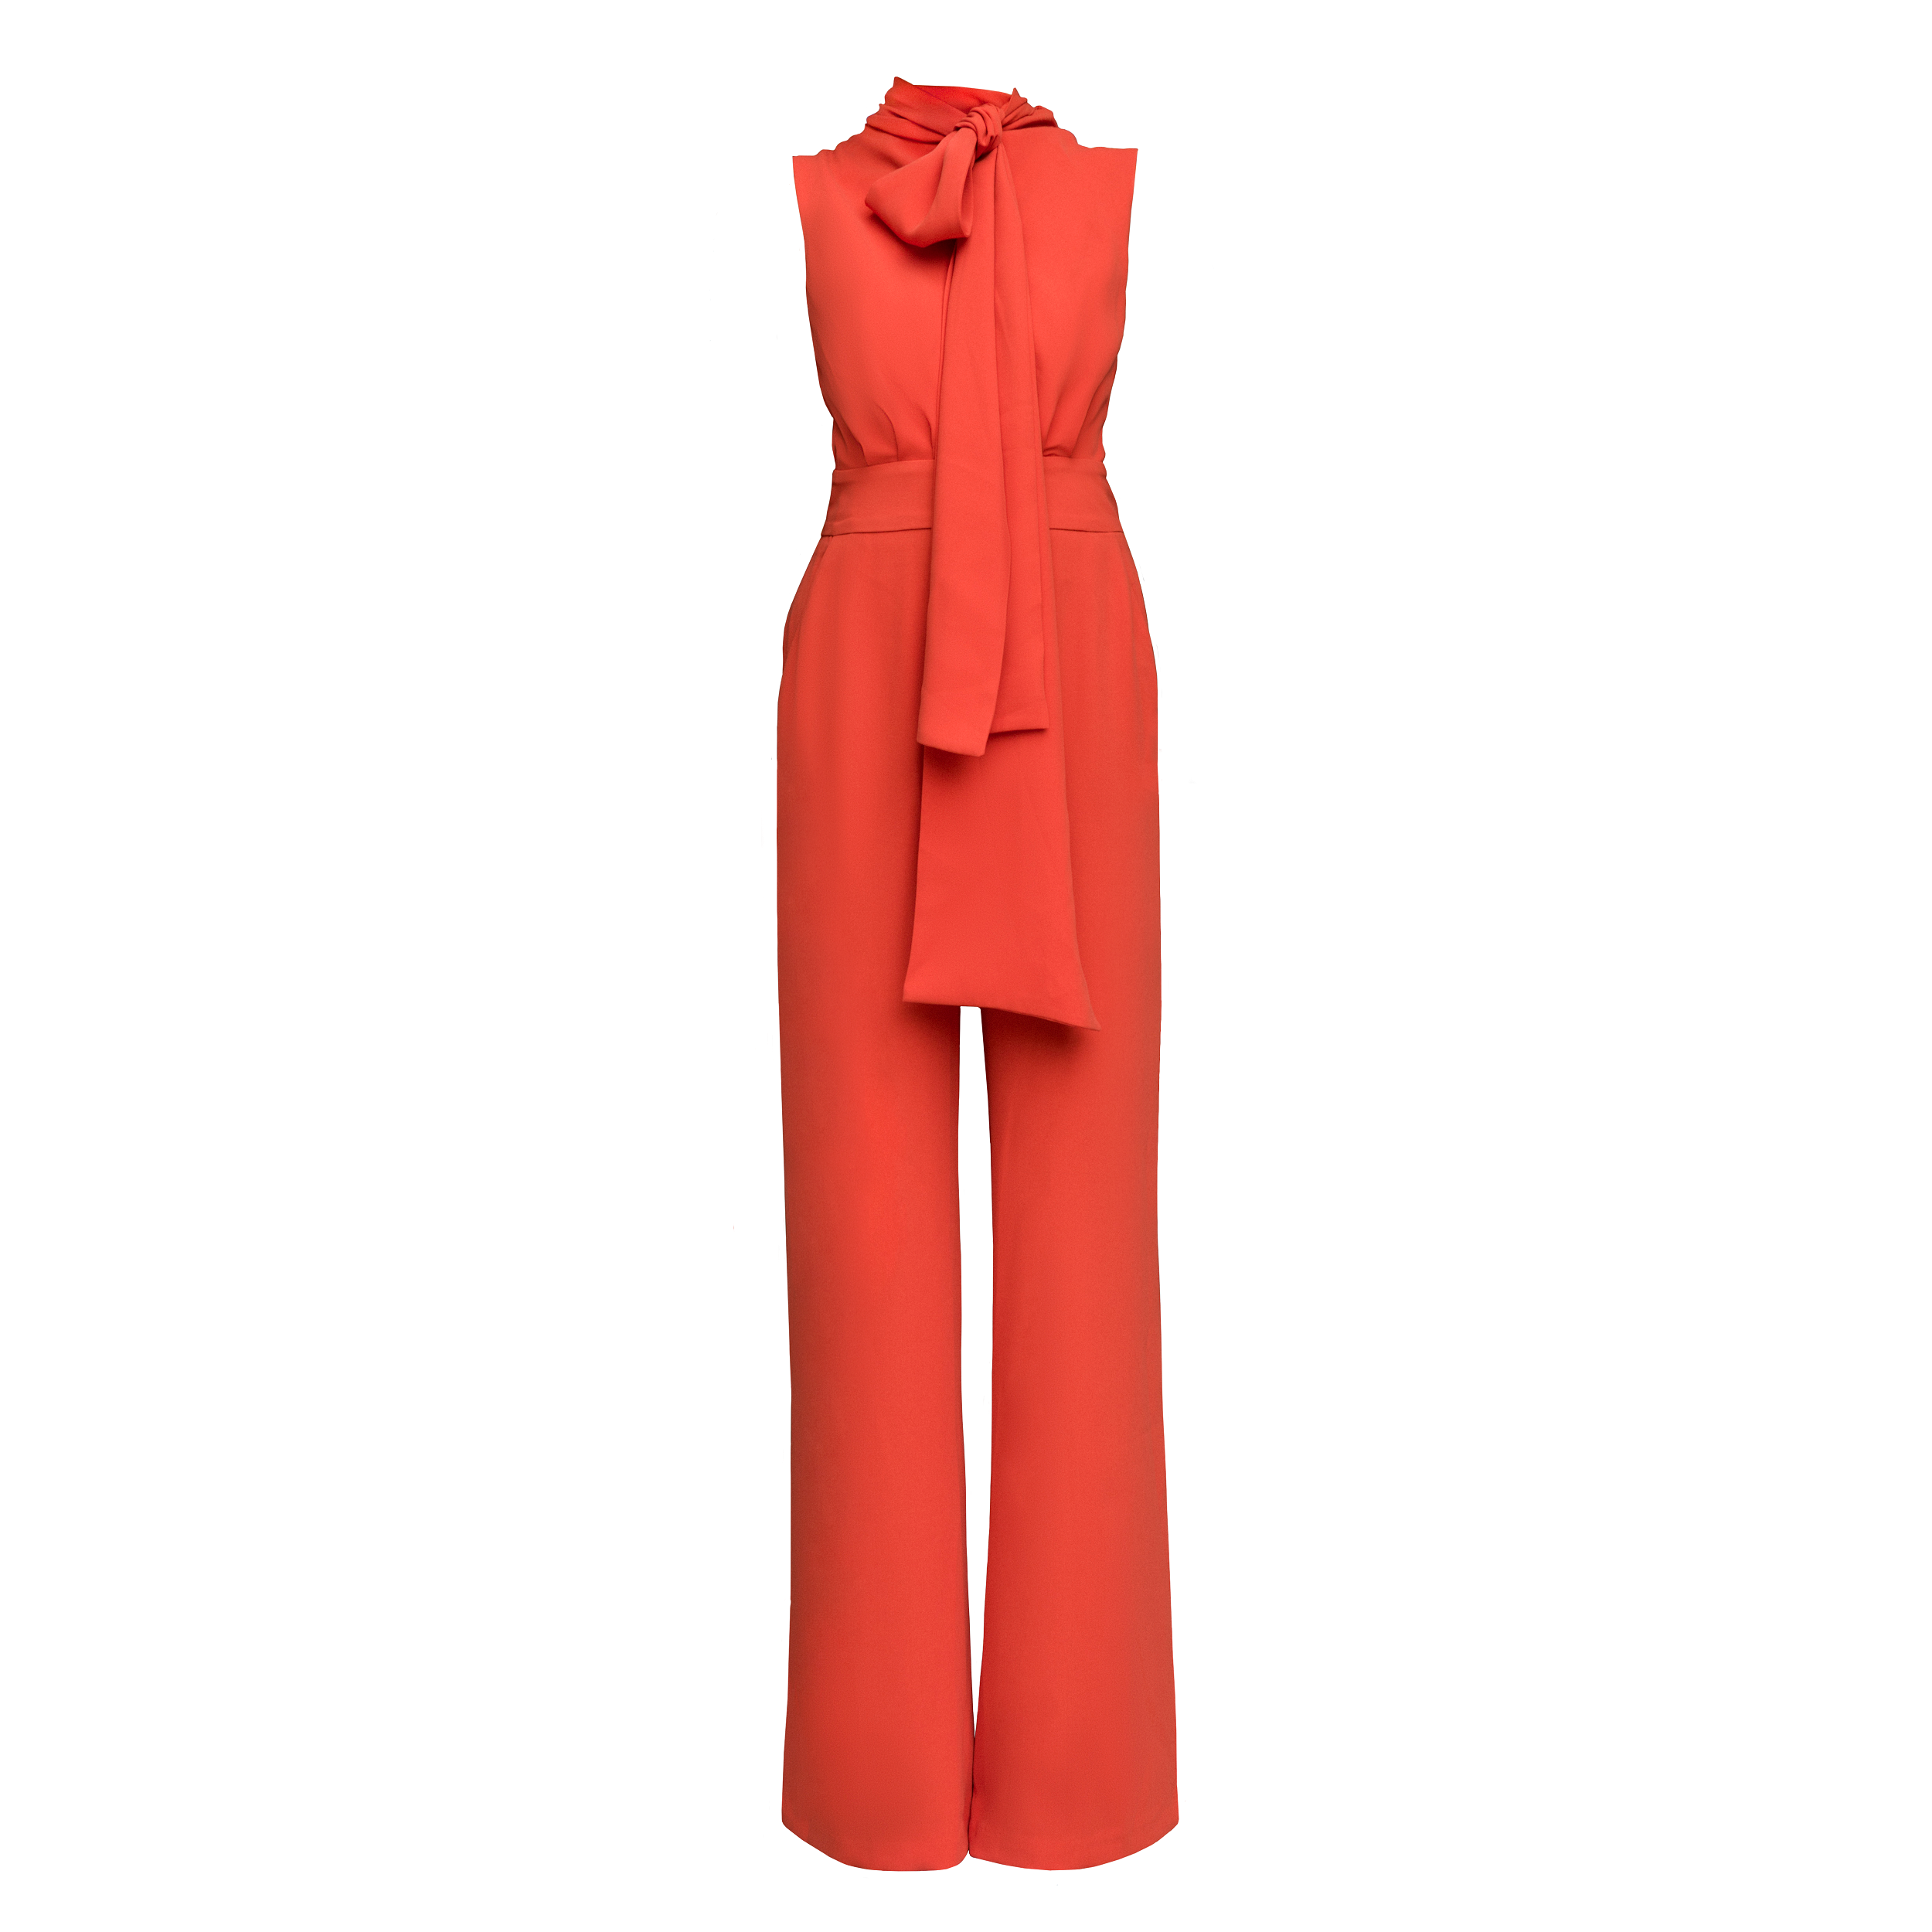 online store ff625 2343c roberta-biagi | Luxgallery